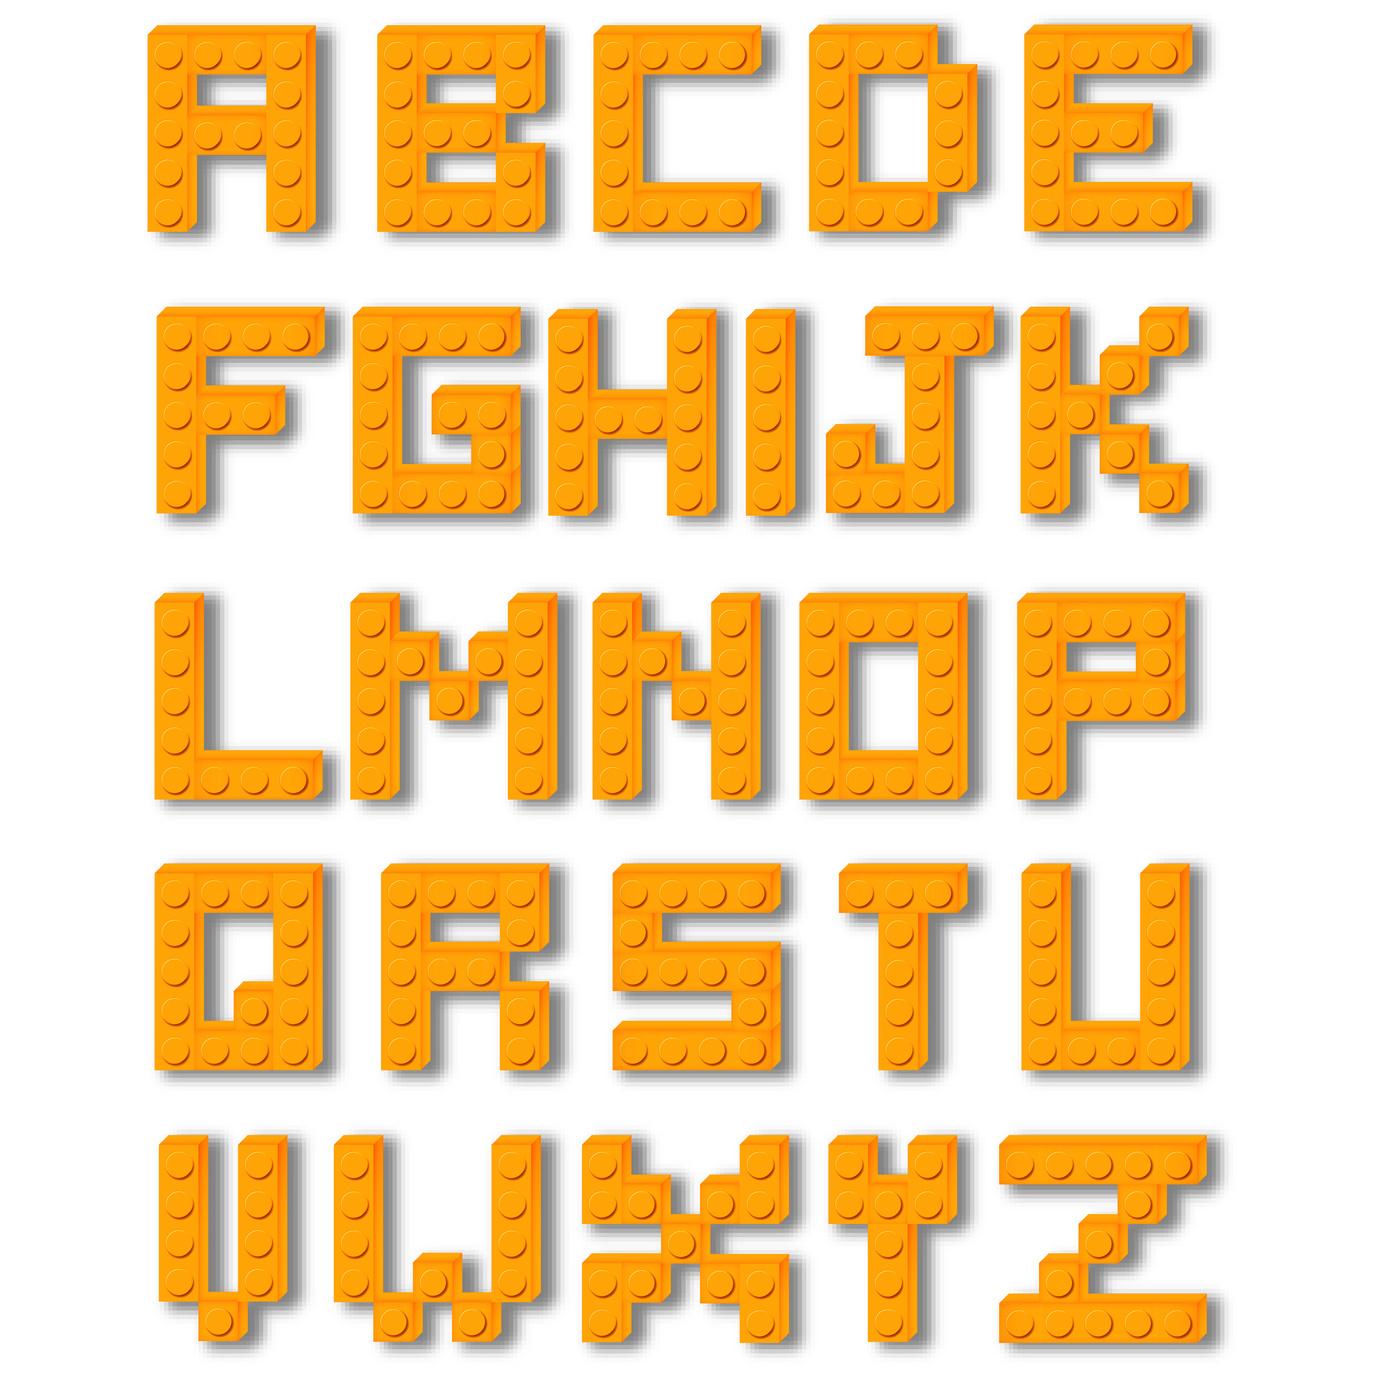 Letters alfabet Lego